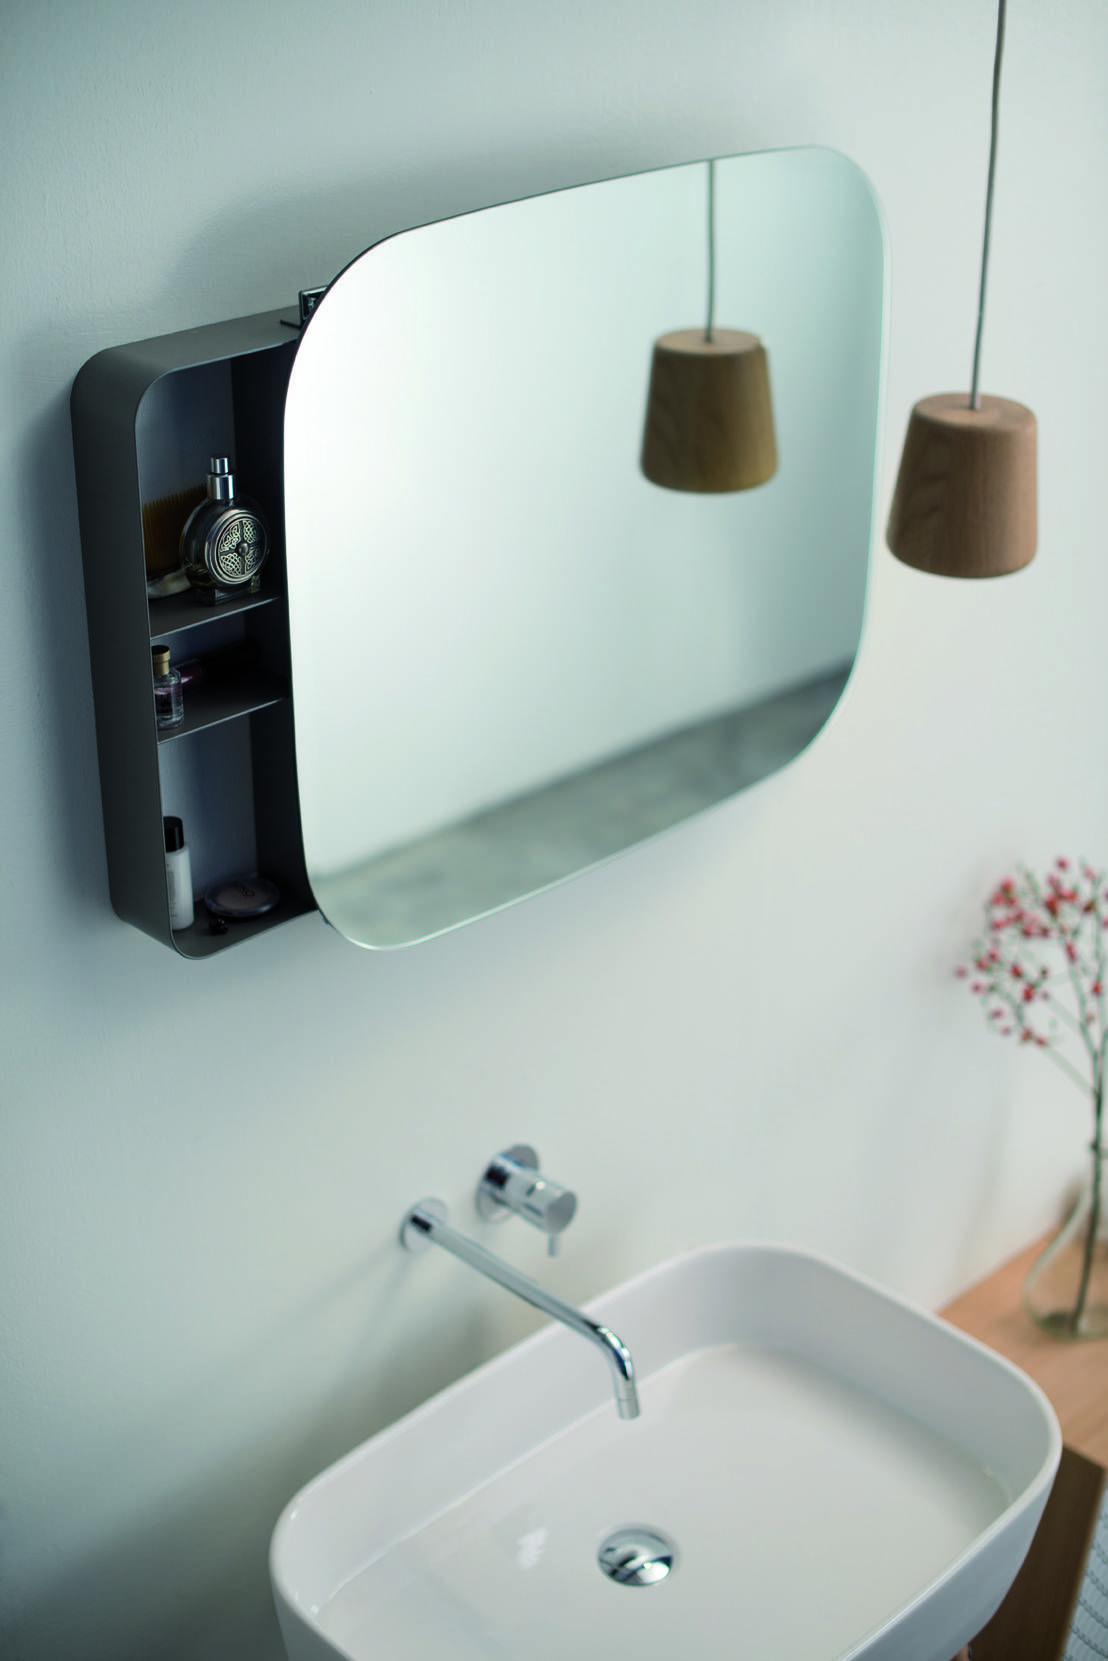 Brilliant ways to upgrade your bathroom | Pinterest | Sinks, Storage ...